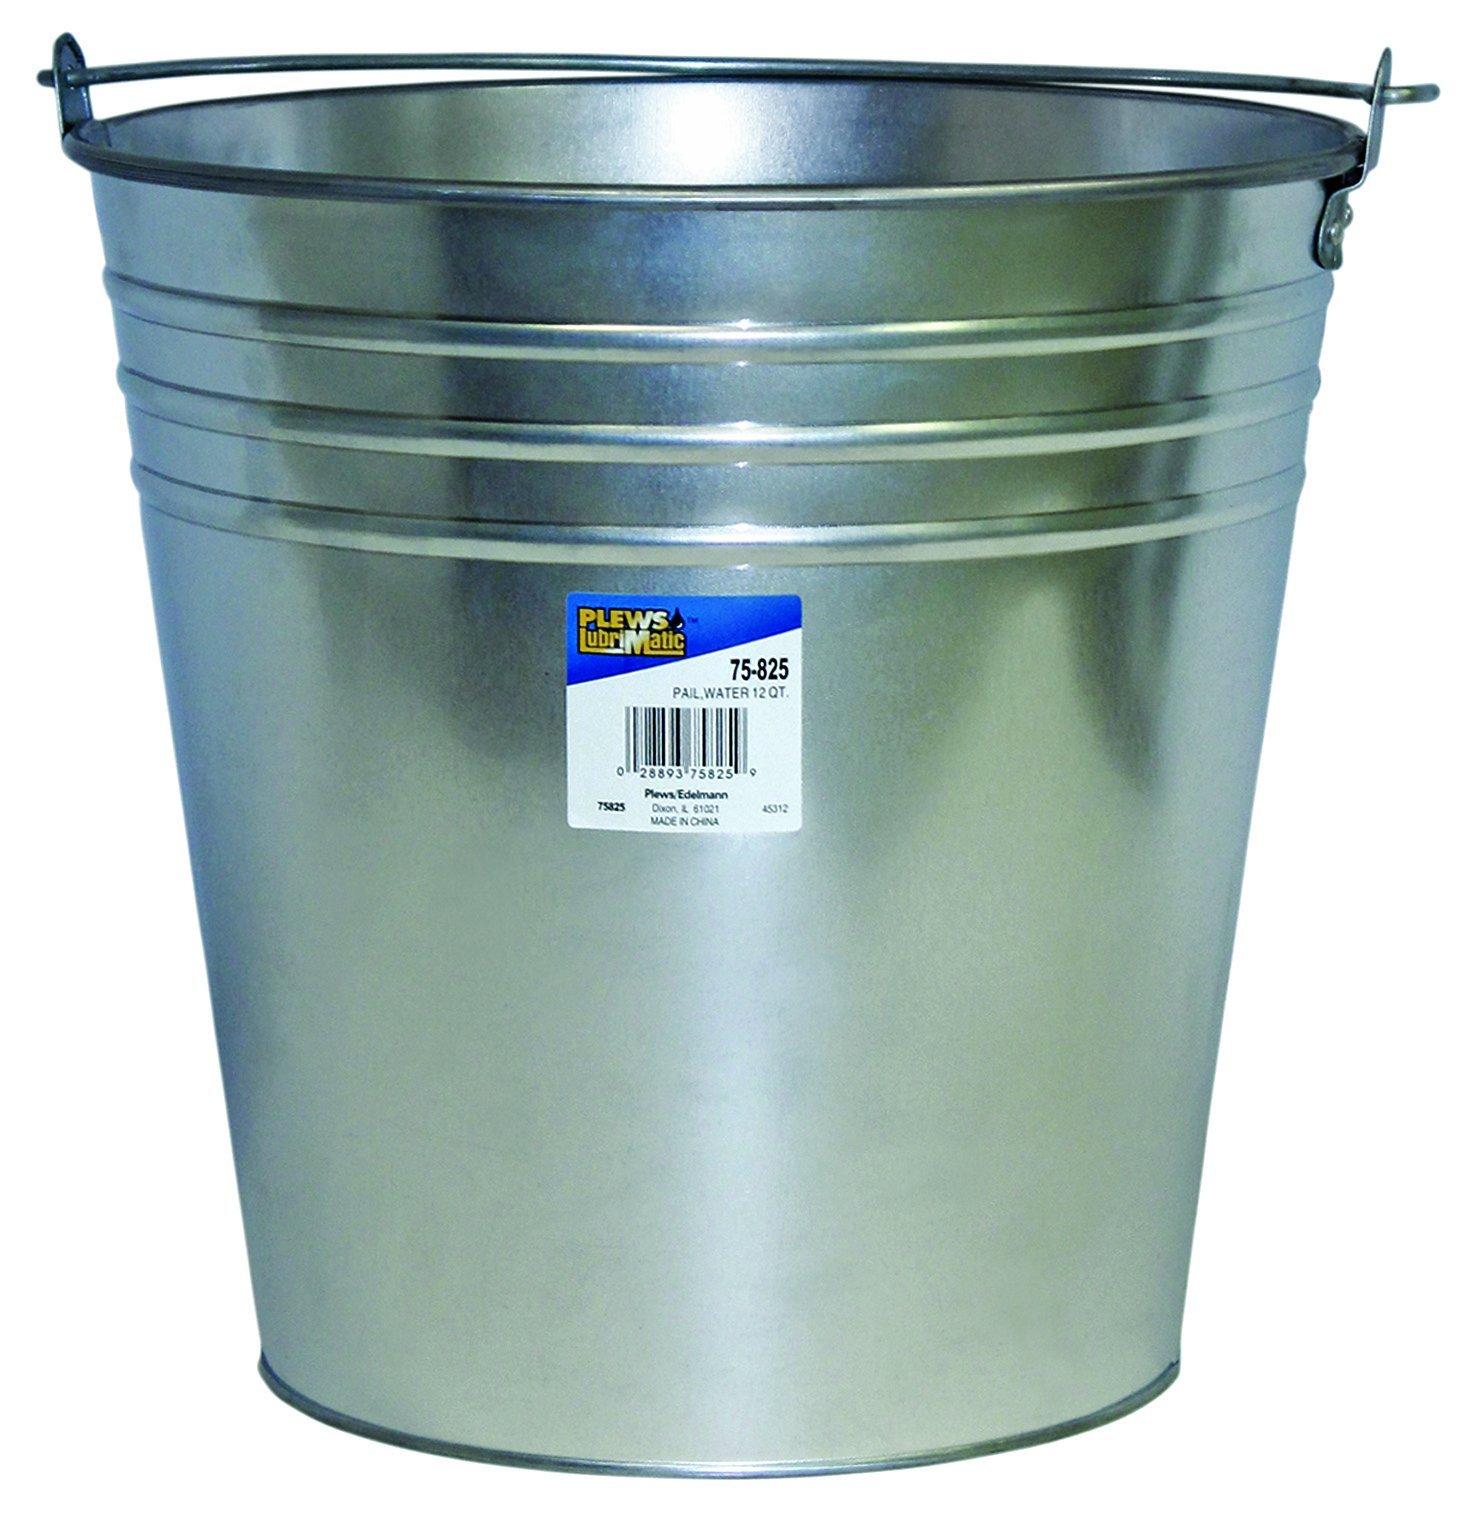 Plews 75-825 Galvanized Water Pail